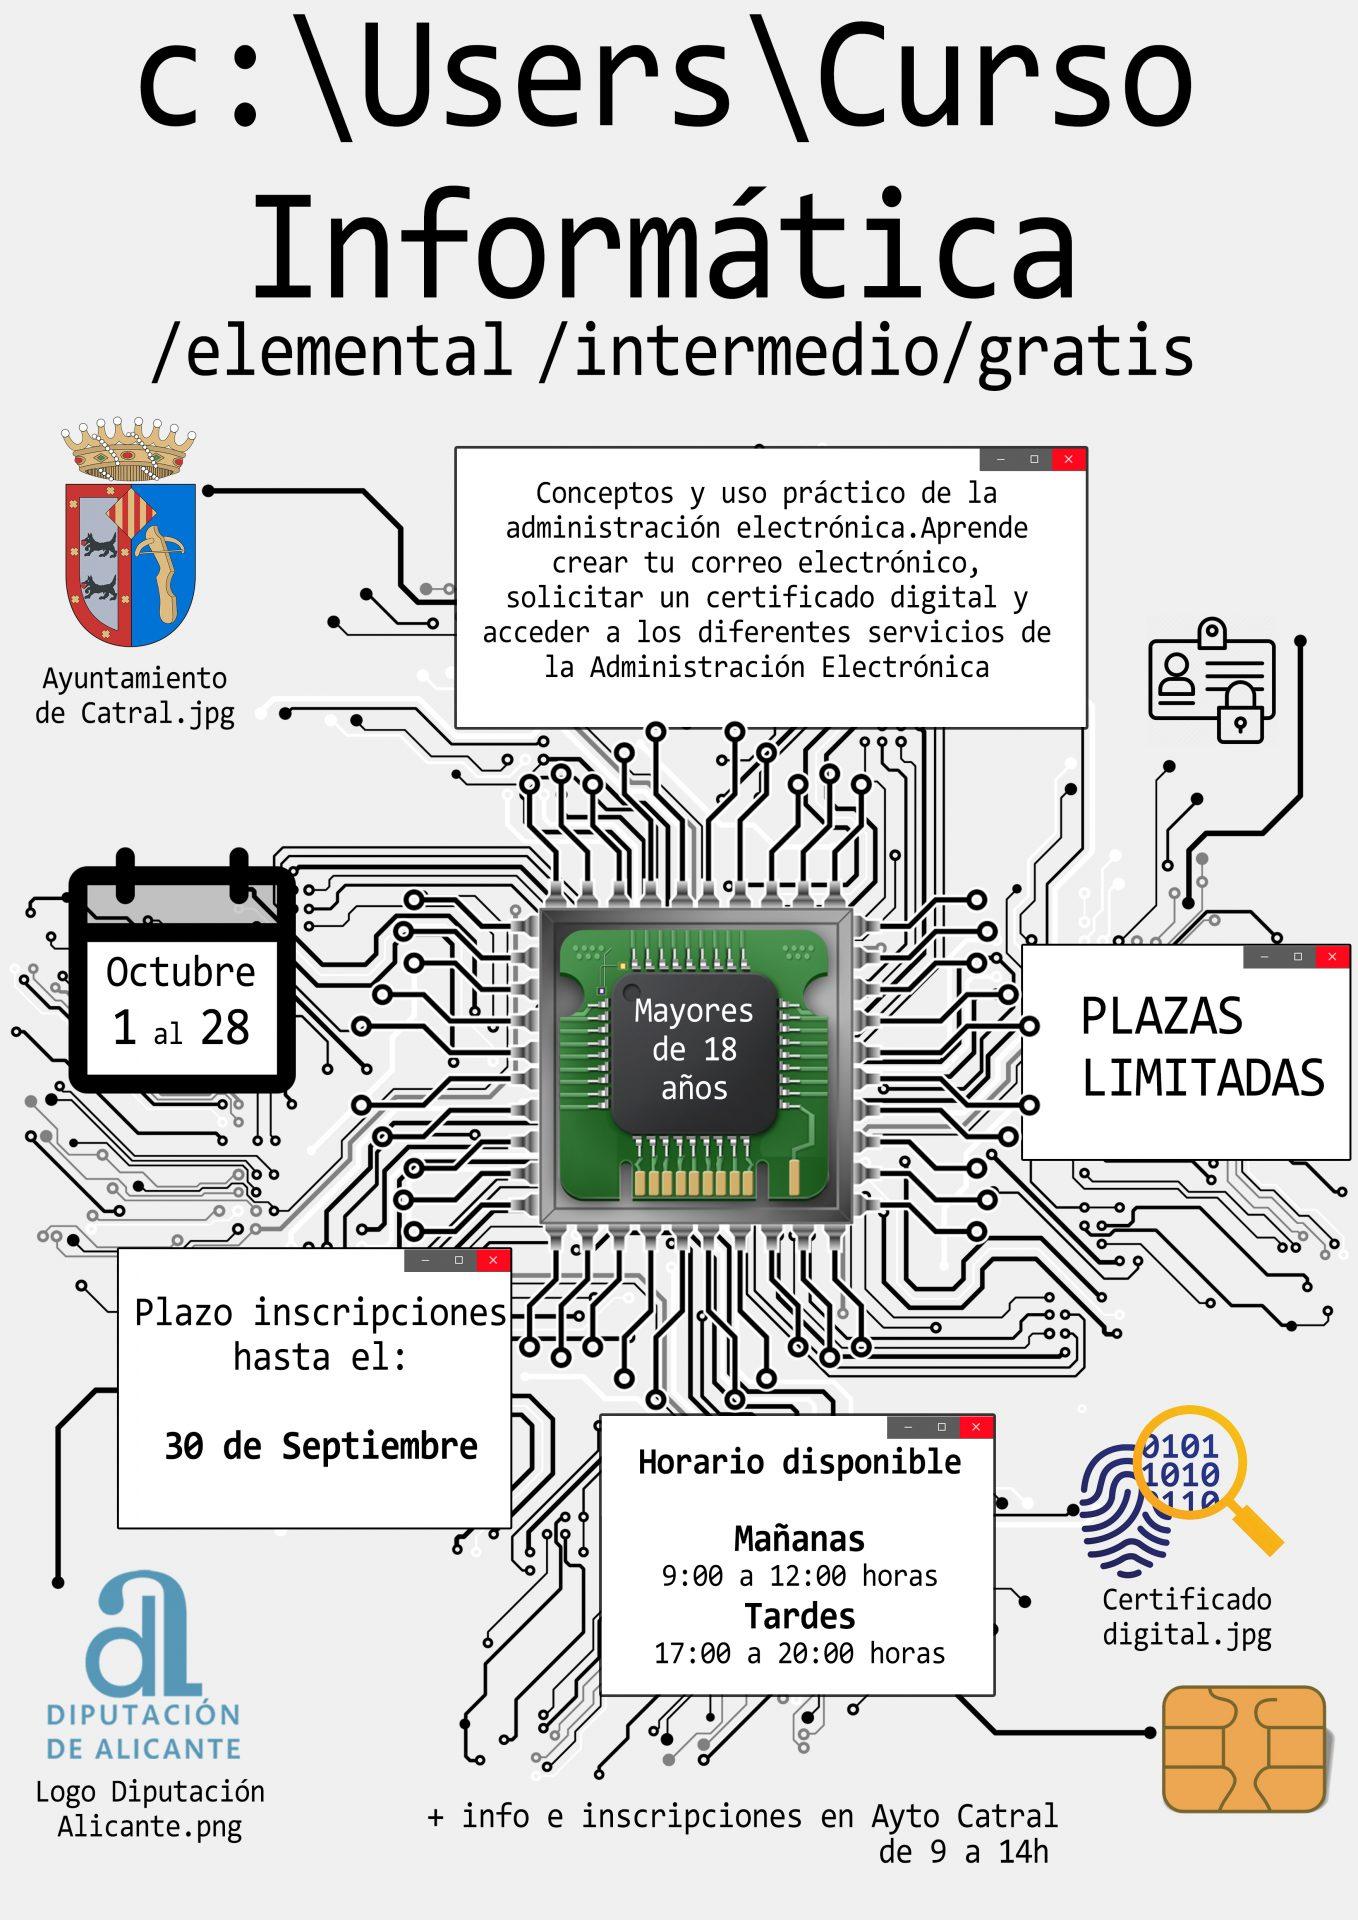 Curso de Informática - Administración Electrónica